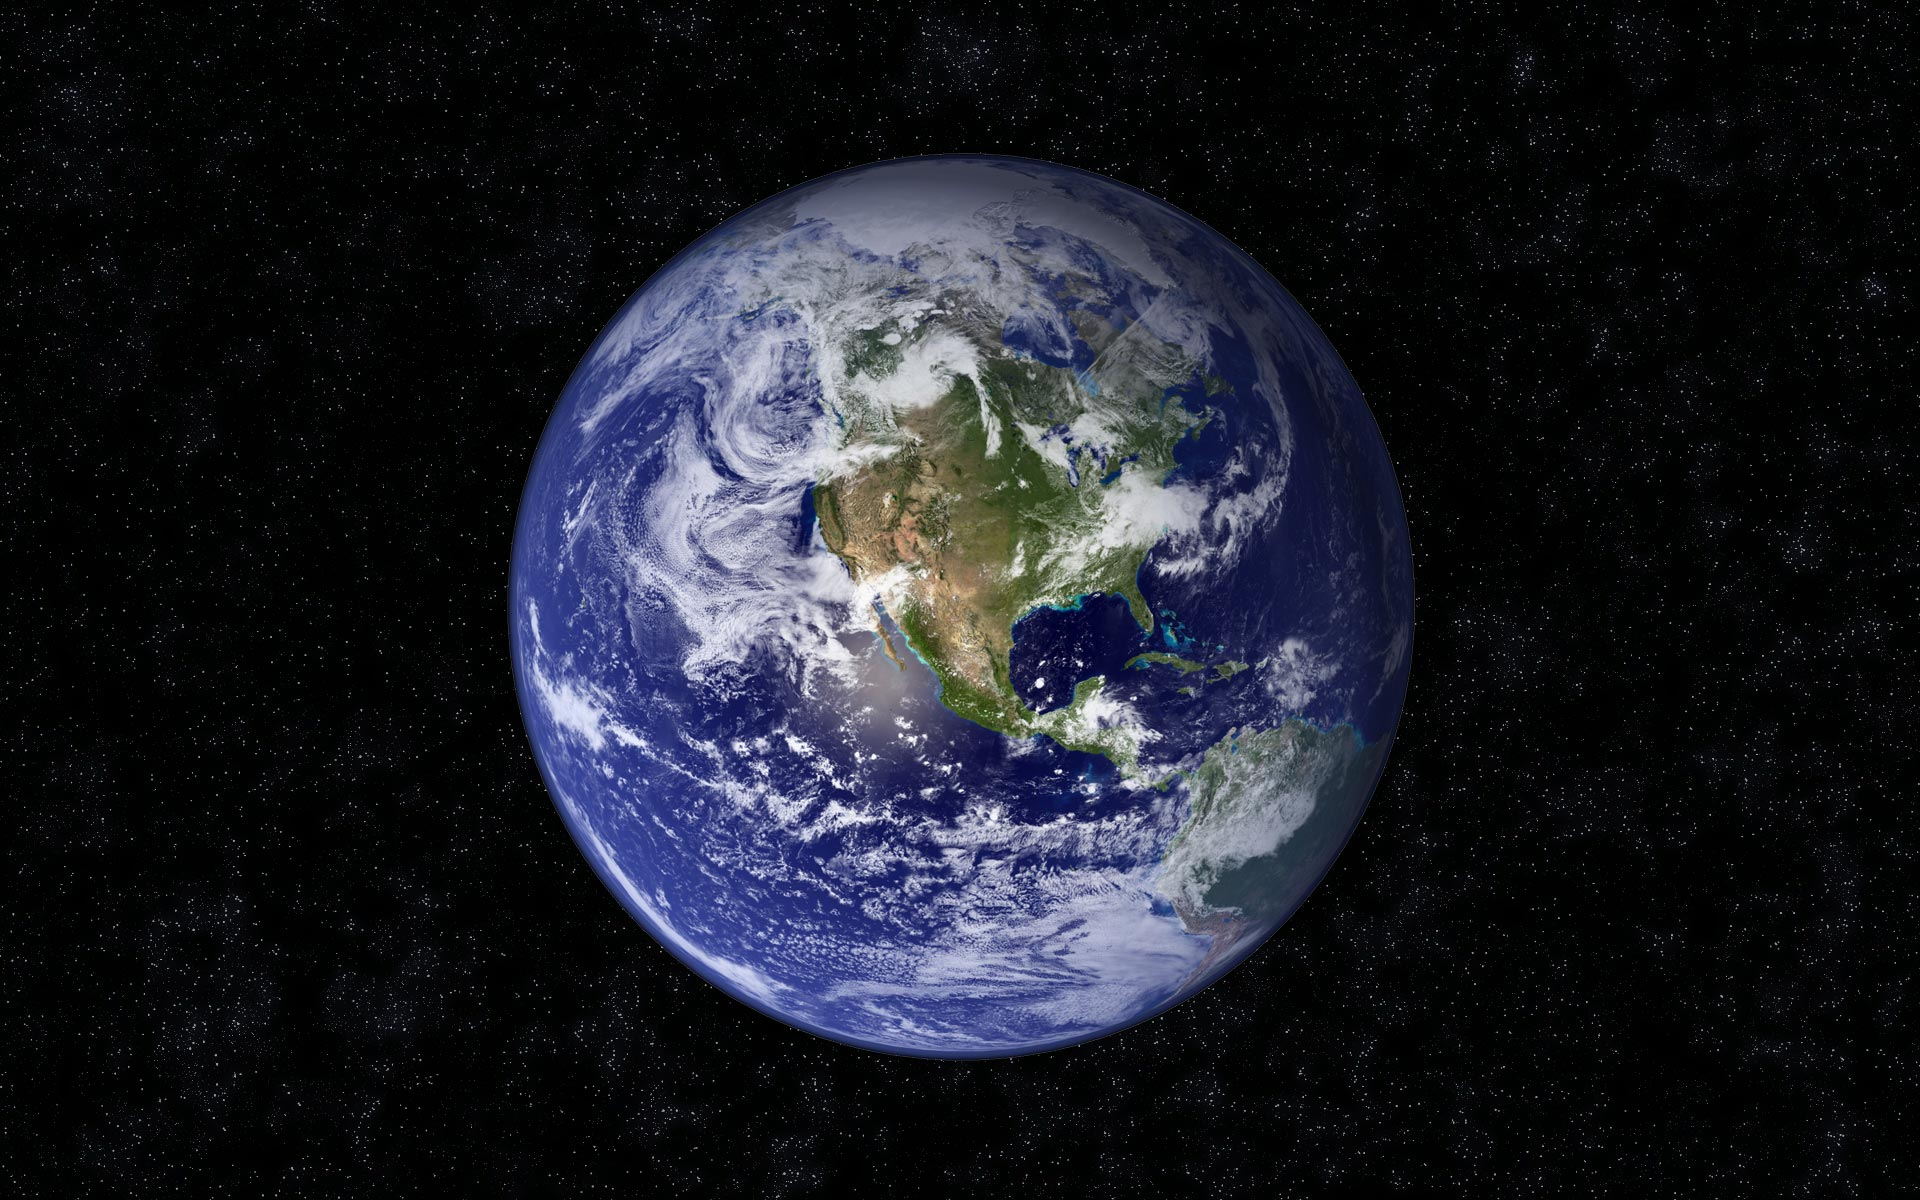 1920x1200 Planet Earth desktop PC and Mac wallpaper 1920x1200